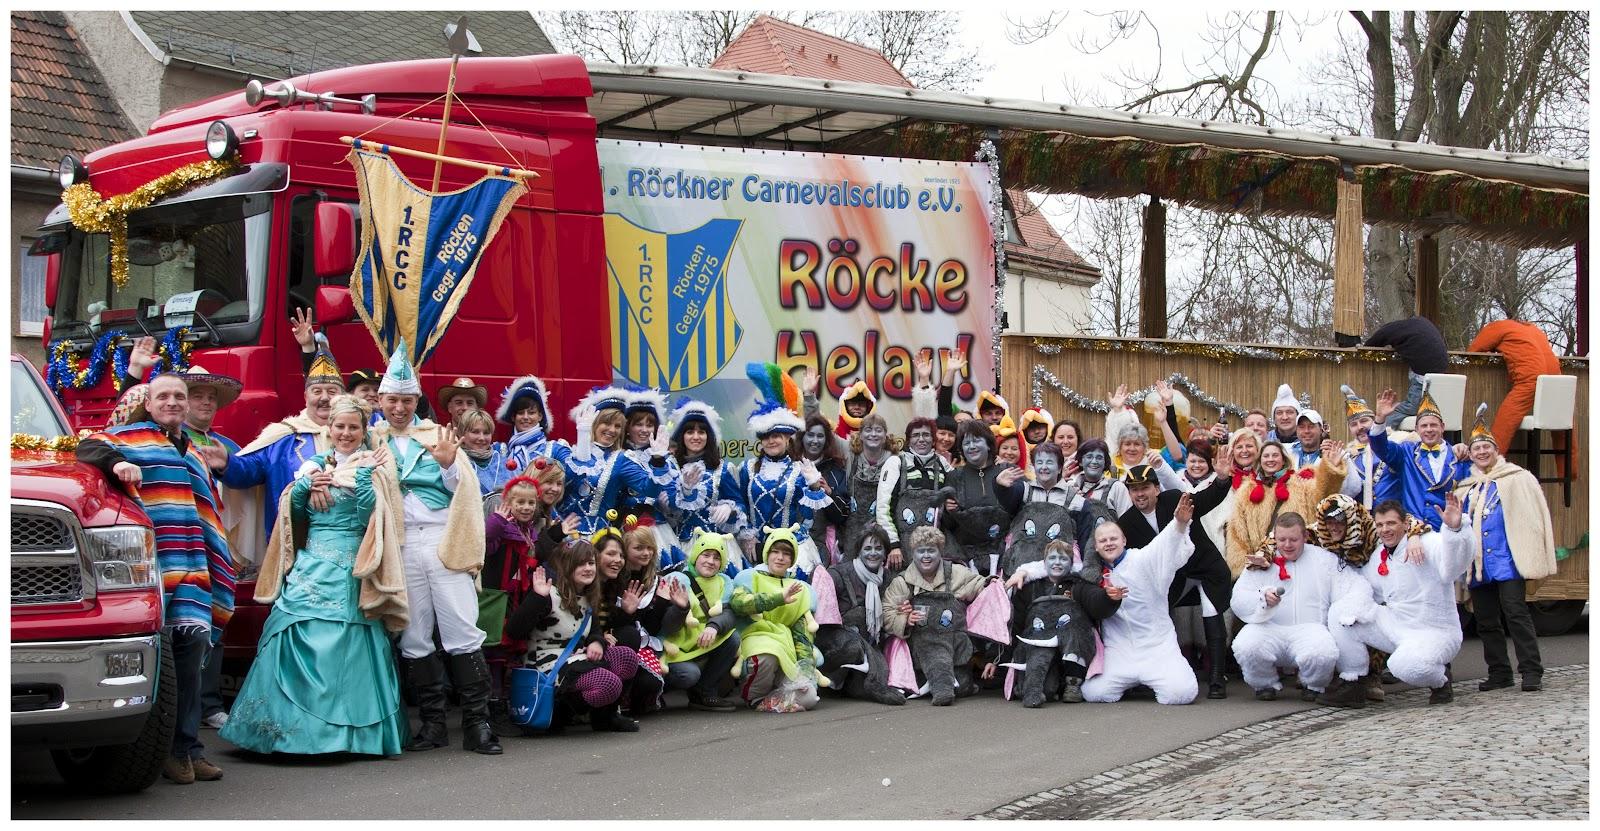 Offizieller Blog Des 1 Rockner Carnevalsclub 1 Rcc Umzug In Pegau